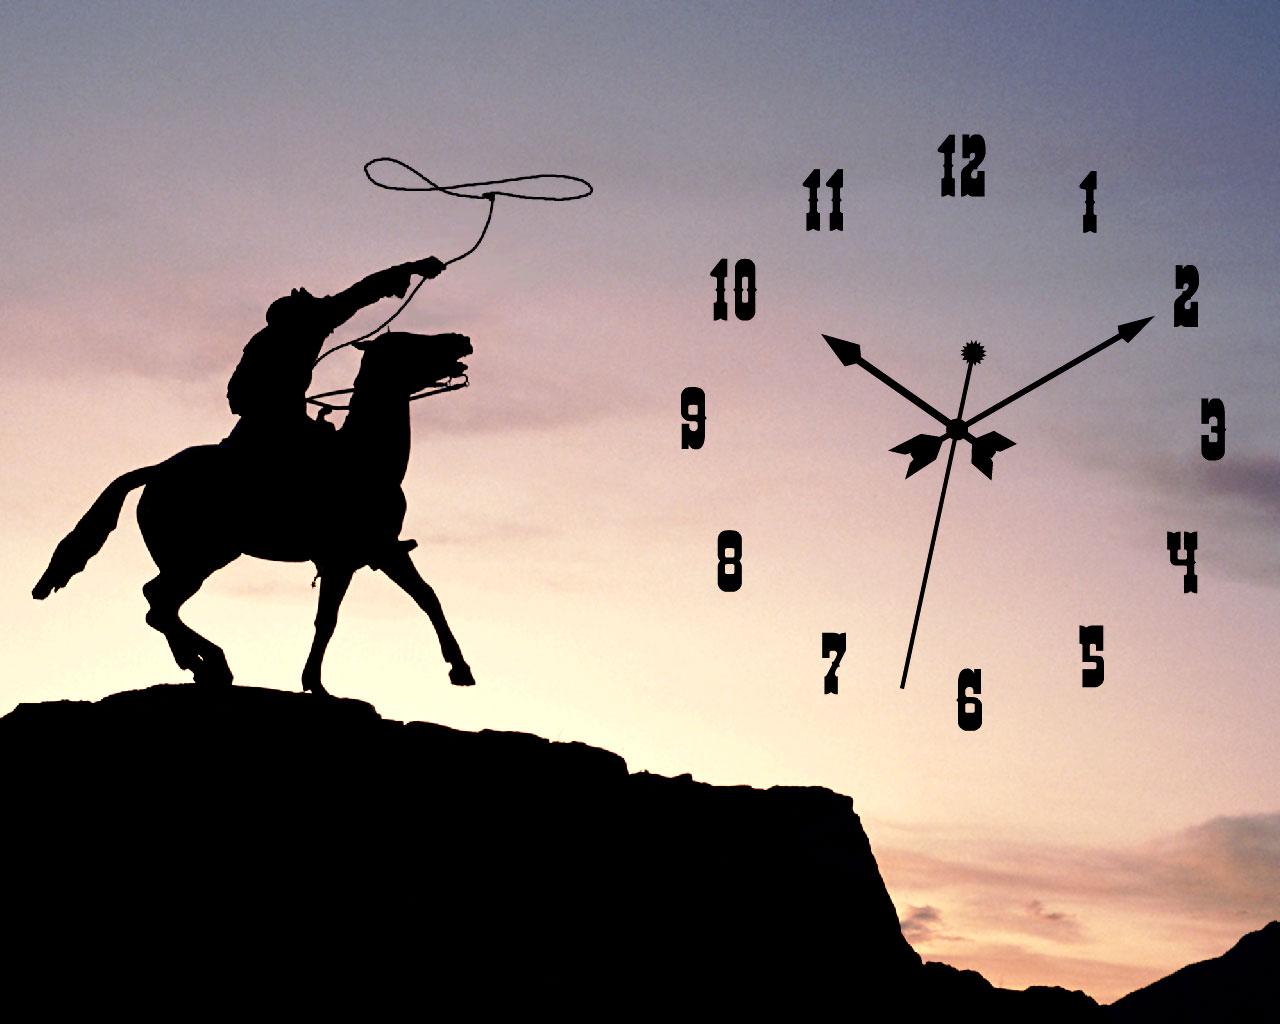 http://1.bp.blogspot.com/-4Q_XgQSu2bY/UKUCTKZE4HI/AAAAAAAABMw/9l2H8xslpZU/s1600/cowboy-clock.jpg